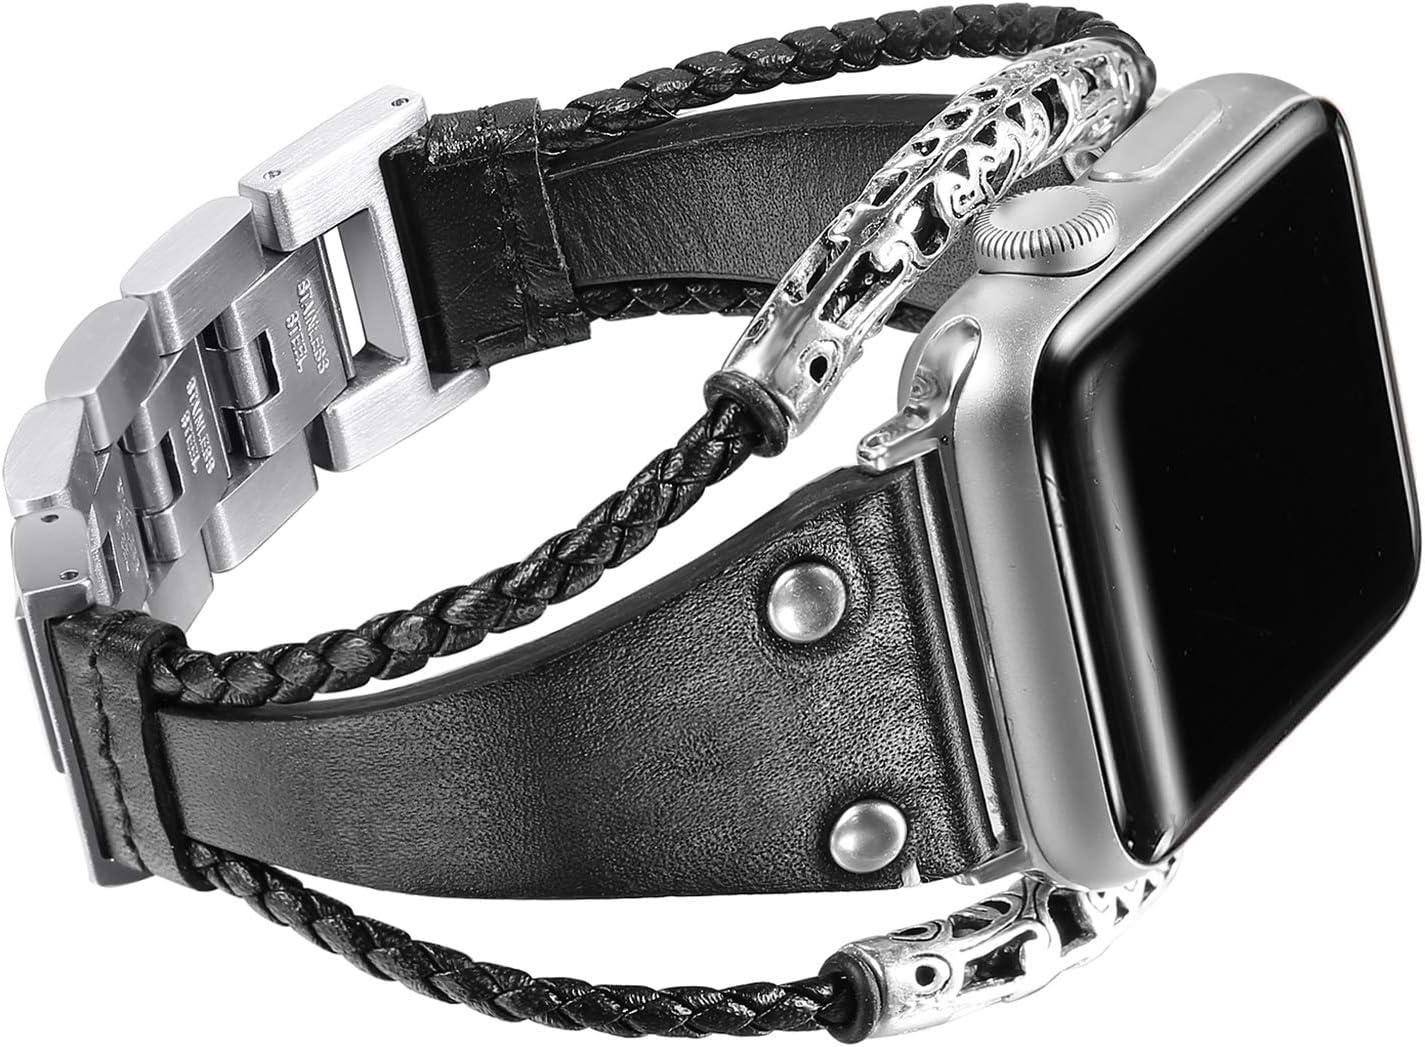 Secbolt Leather Bands Compatible Apple Watch Band Series 4/5/6 44mm, Series 3/2/1 42mm, Double Twist Handmade Vintage Natural Leather Bracelet Replacement Bracelet Straps Women